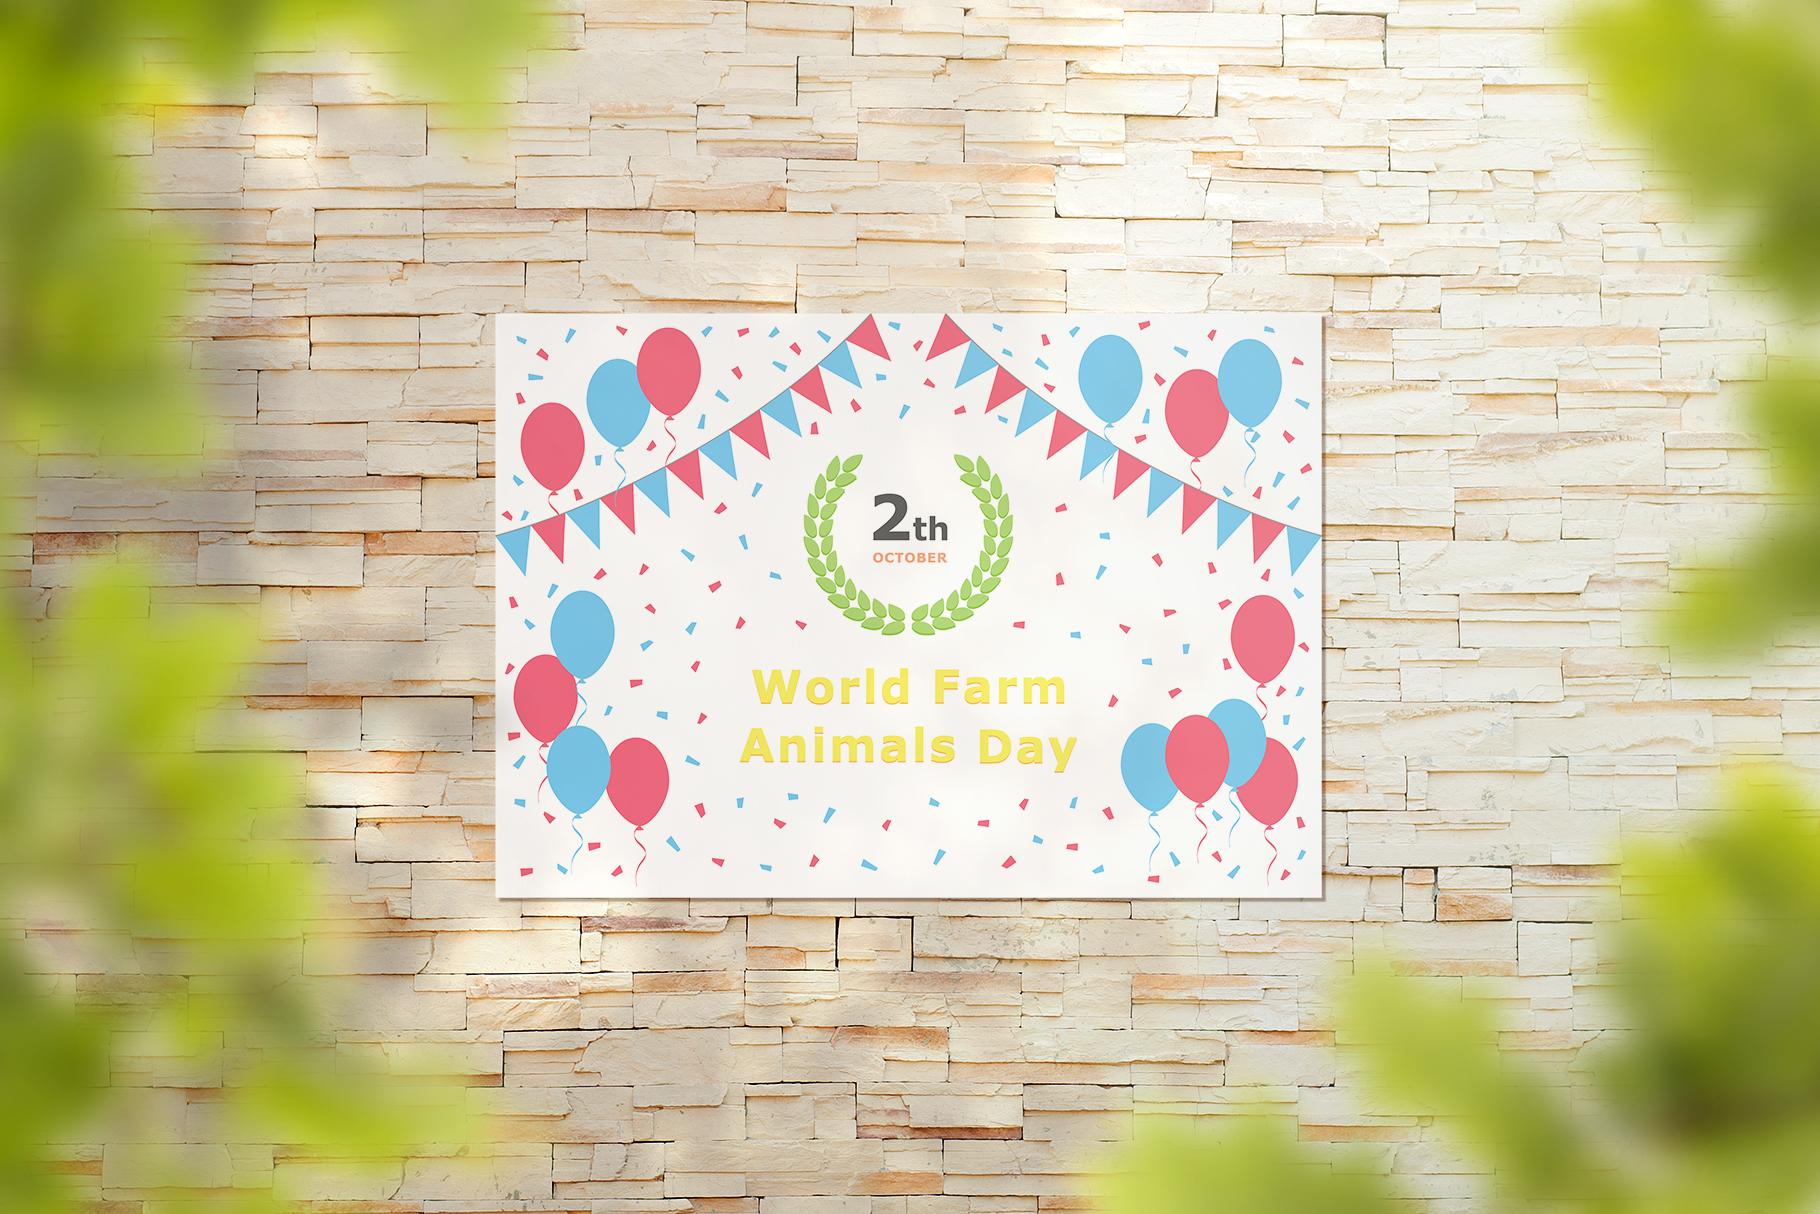 World Farm Animals Day - October 02 example image 4